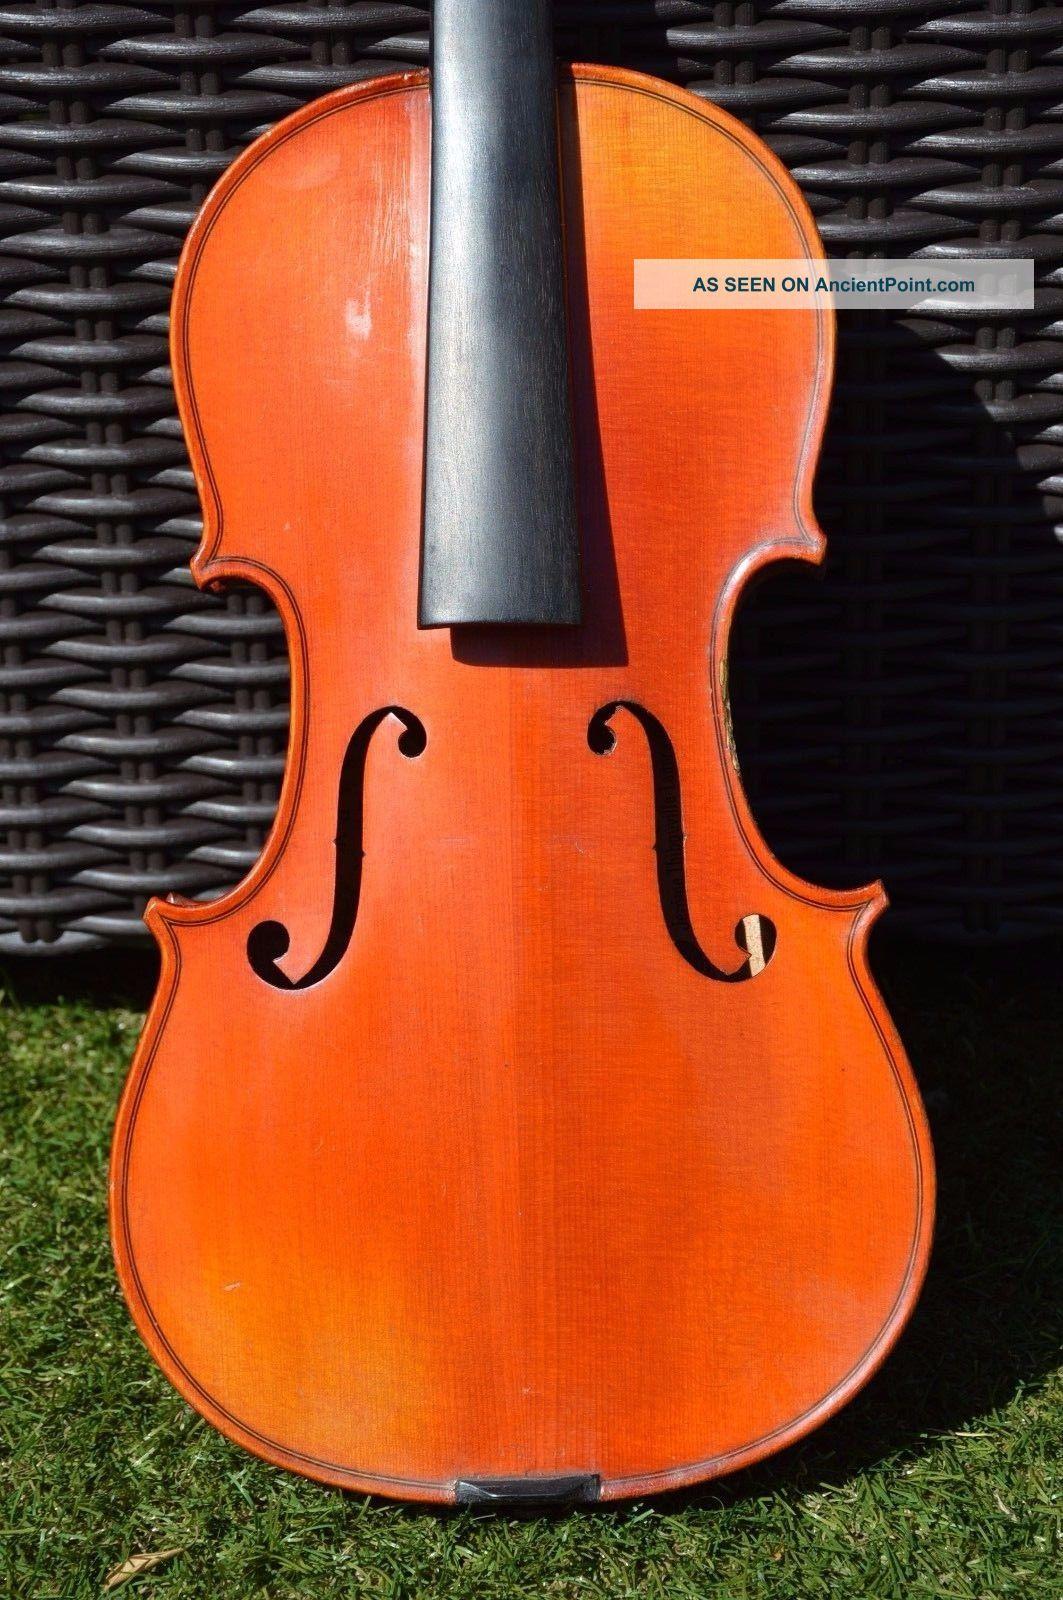 Breton Old French Violin Signed On Back 4/4 String photo